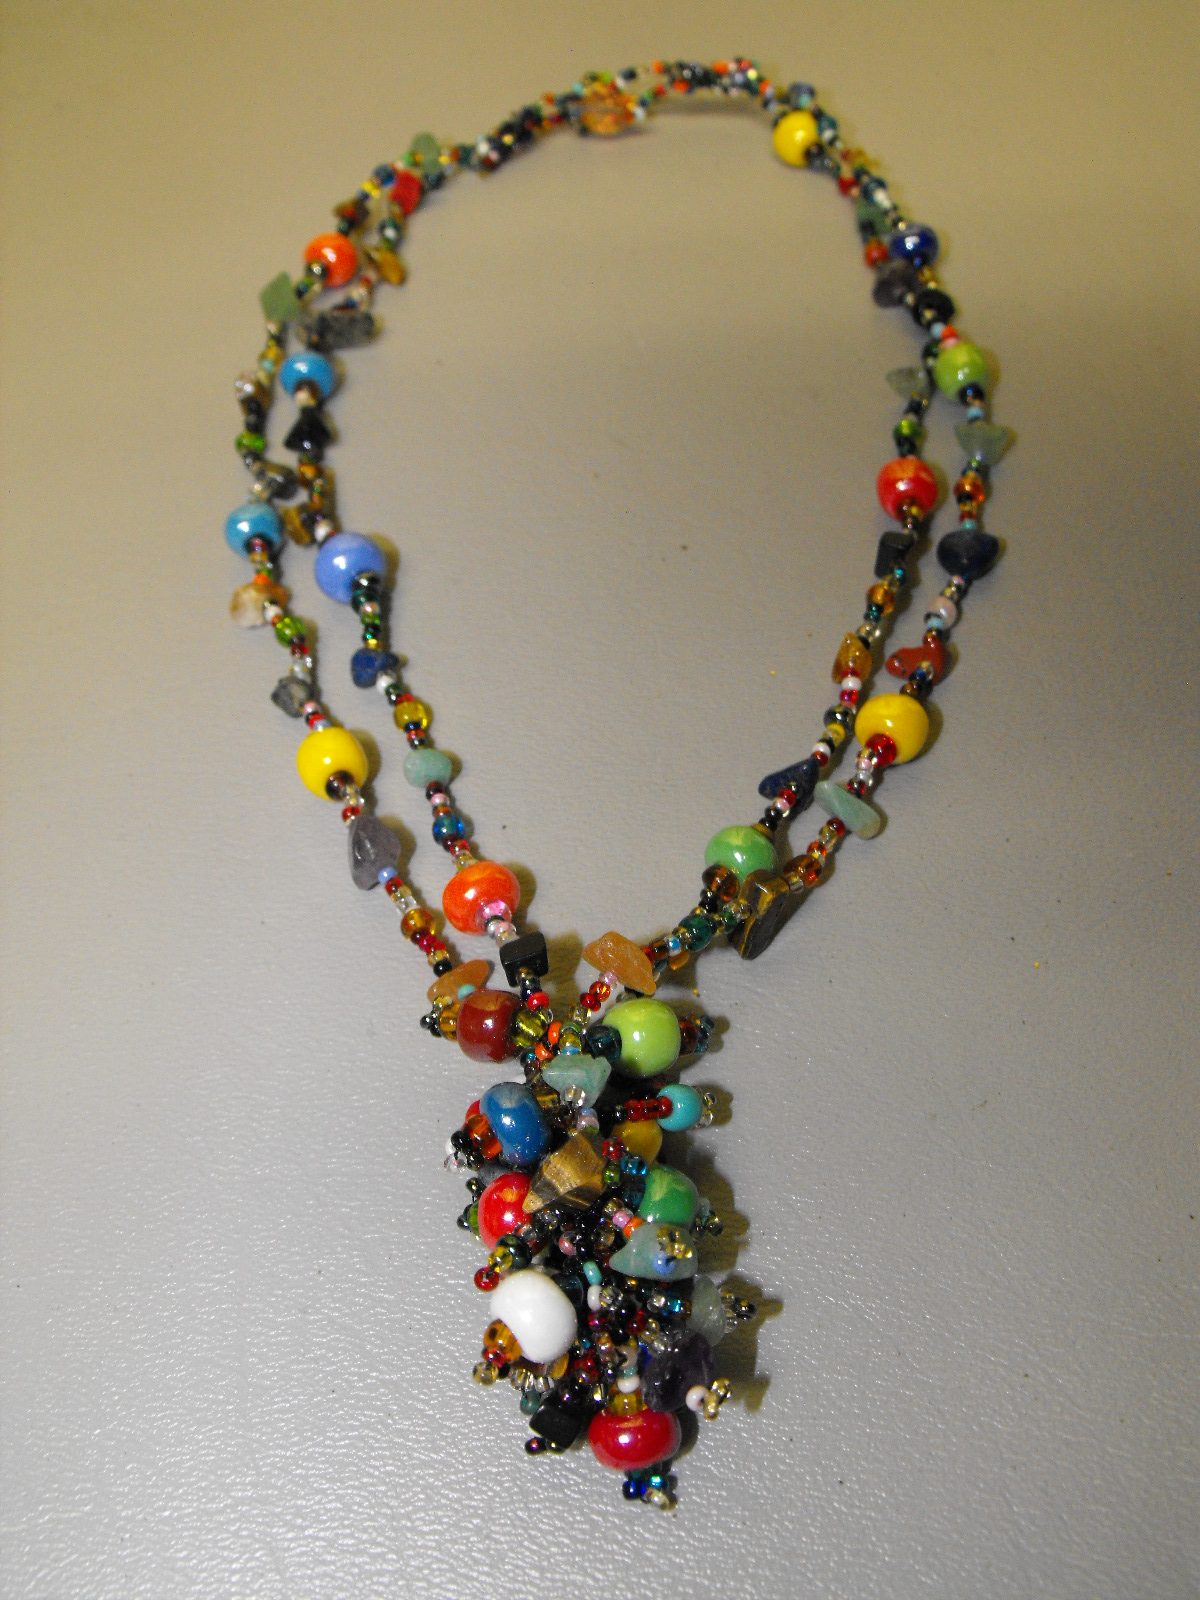 Guatemalan Artisan Crafted Glass Amp Bead Necklace 2